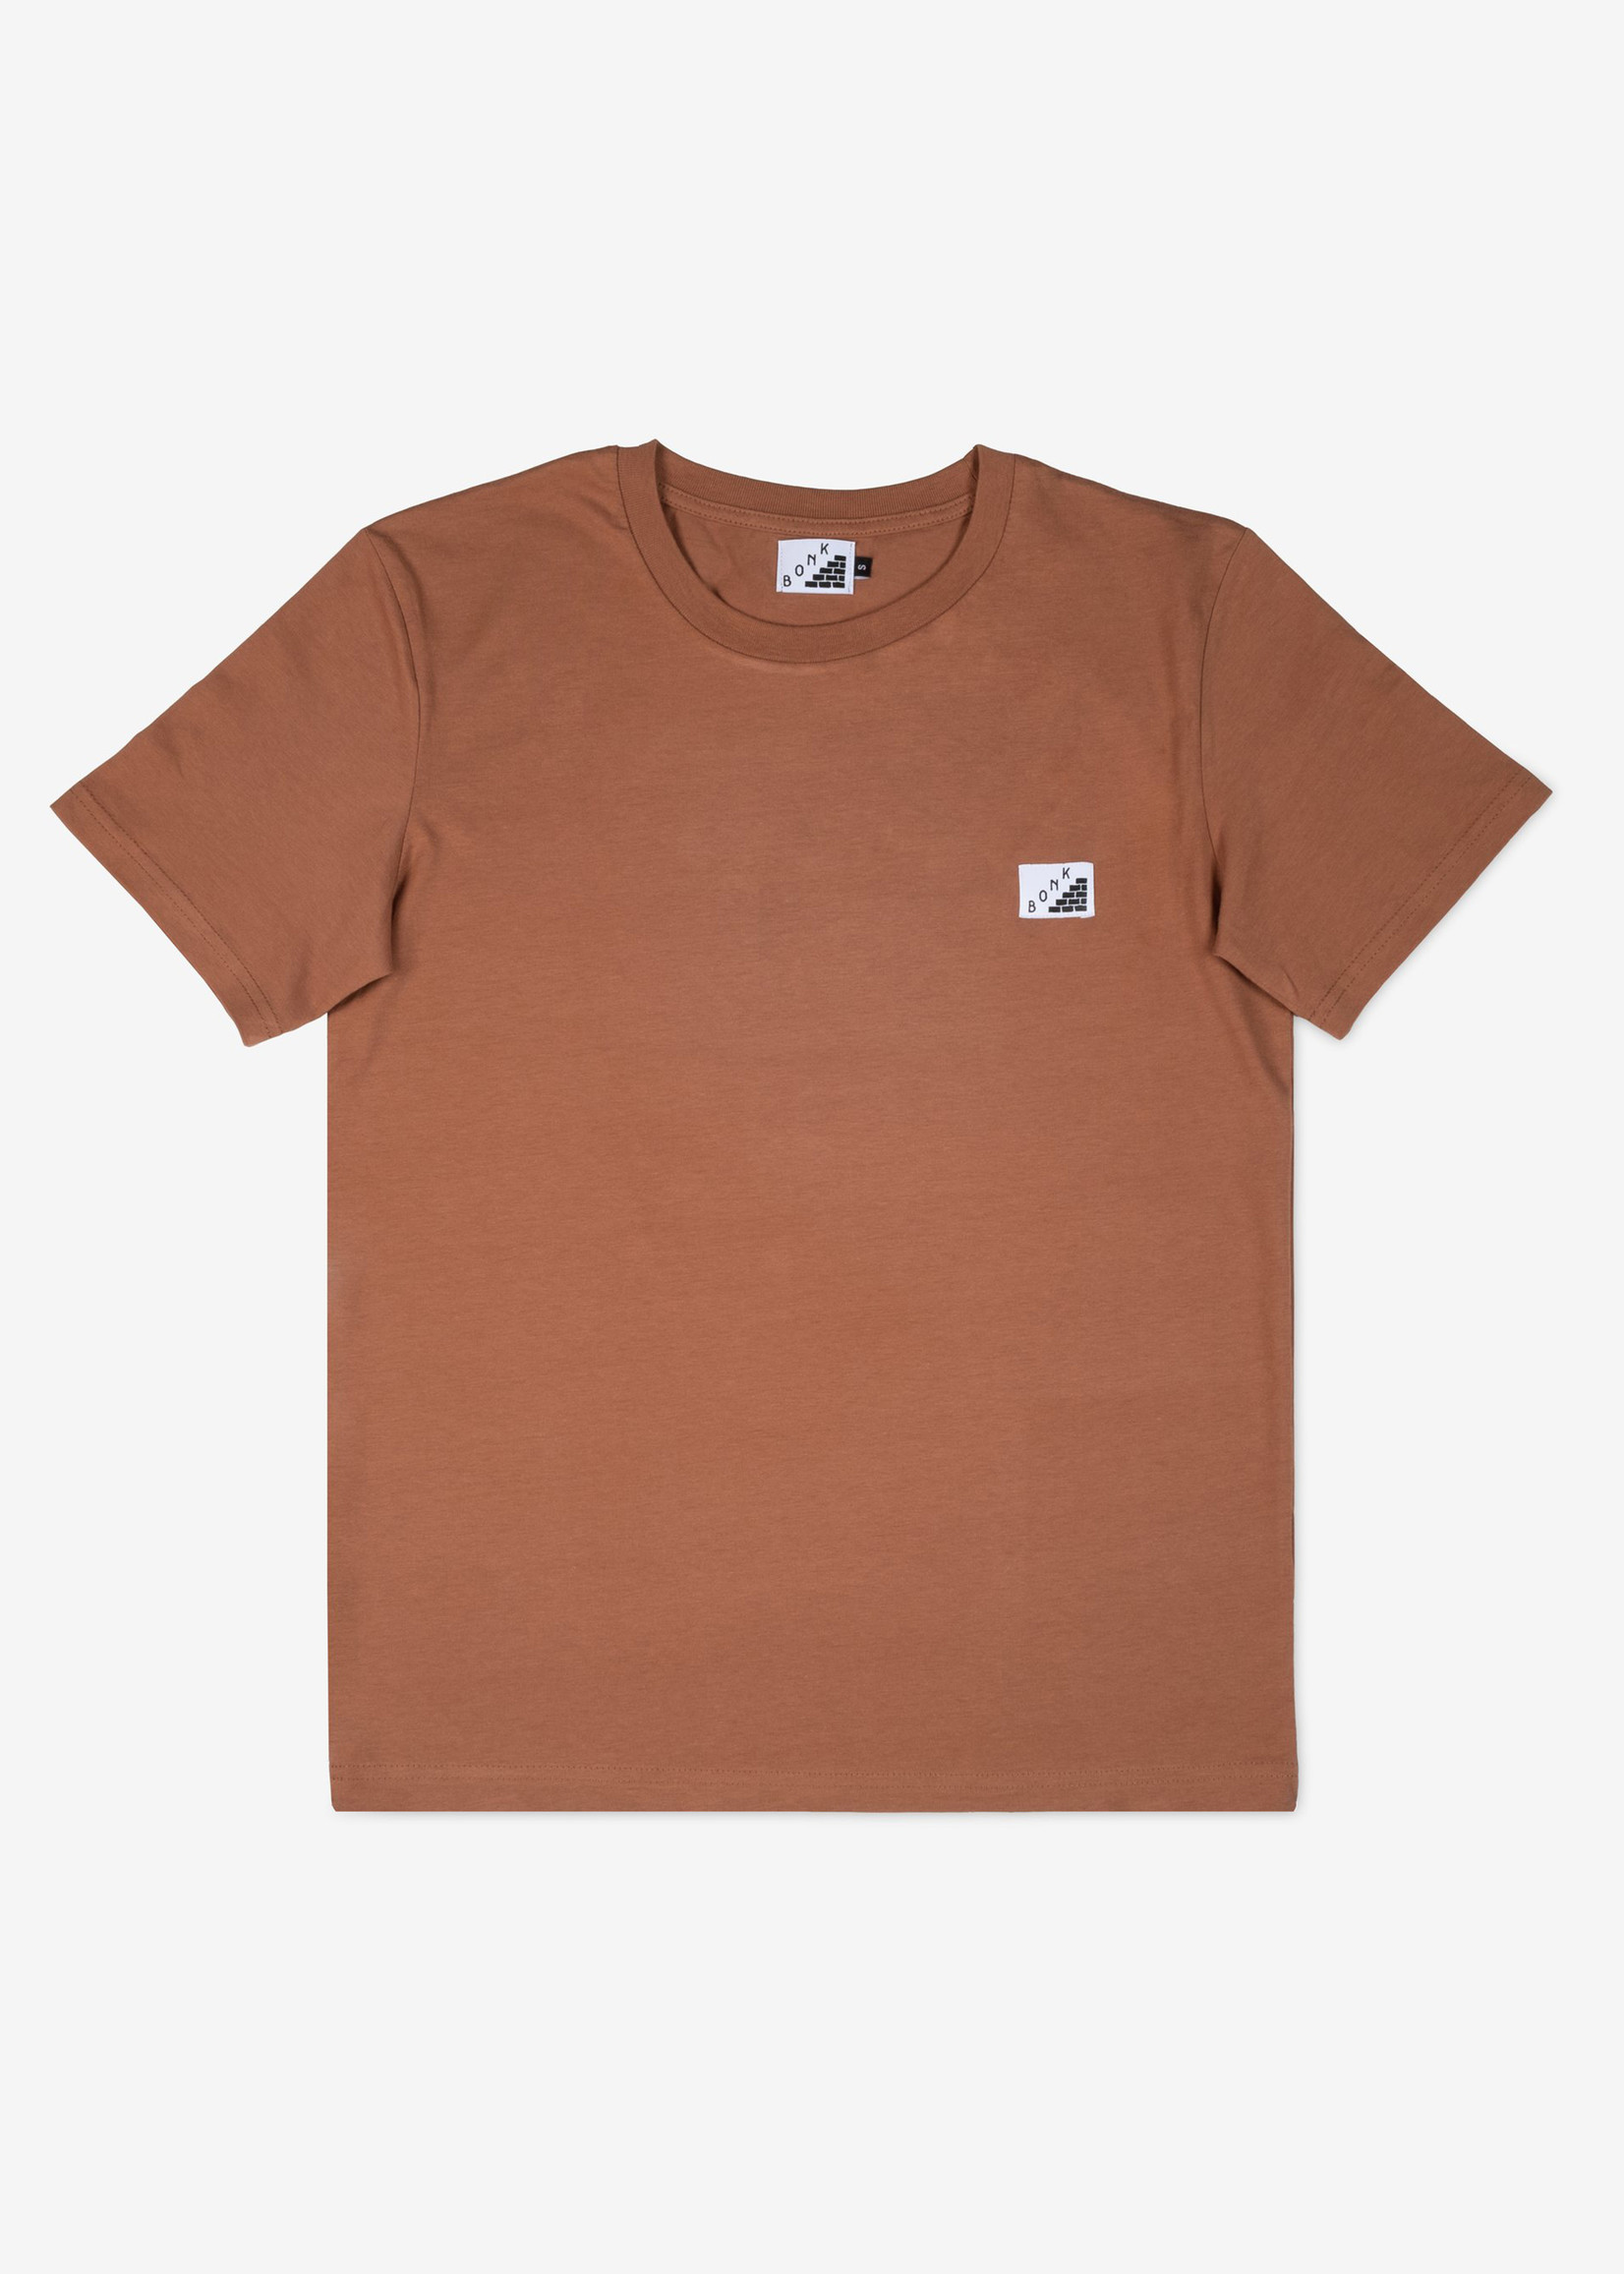 Bonk T-Shirt - Log Out - Chocolate